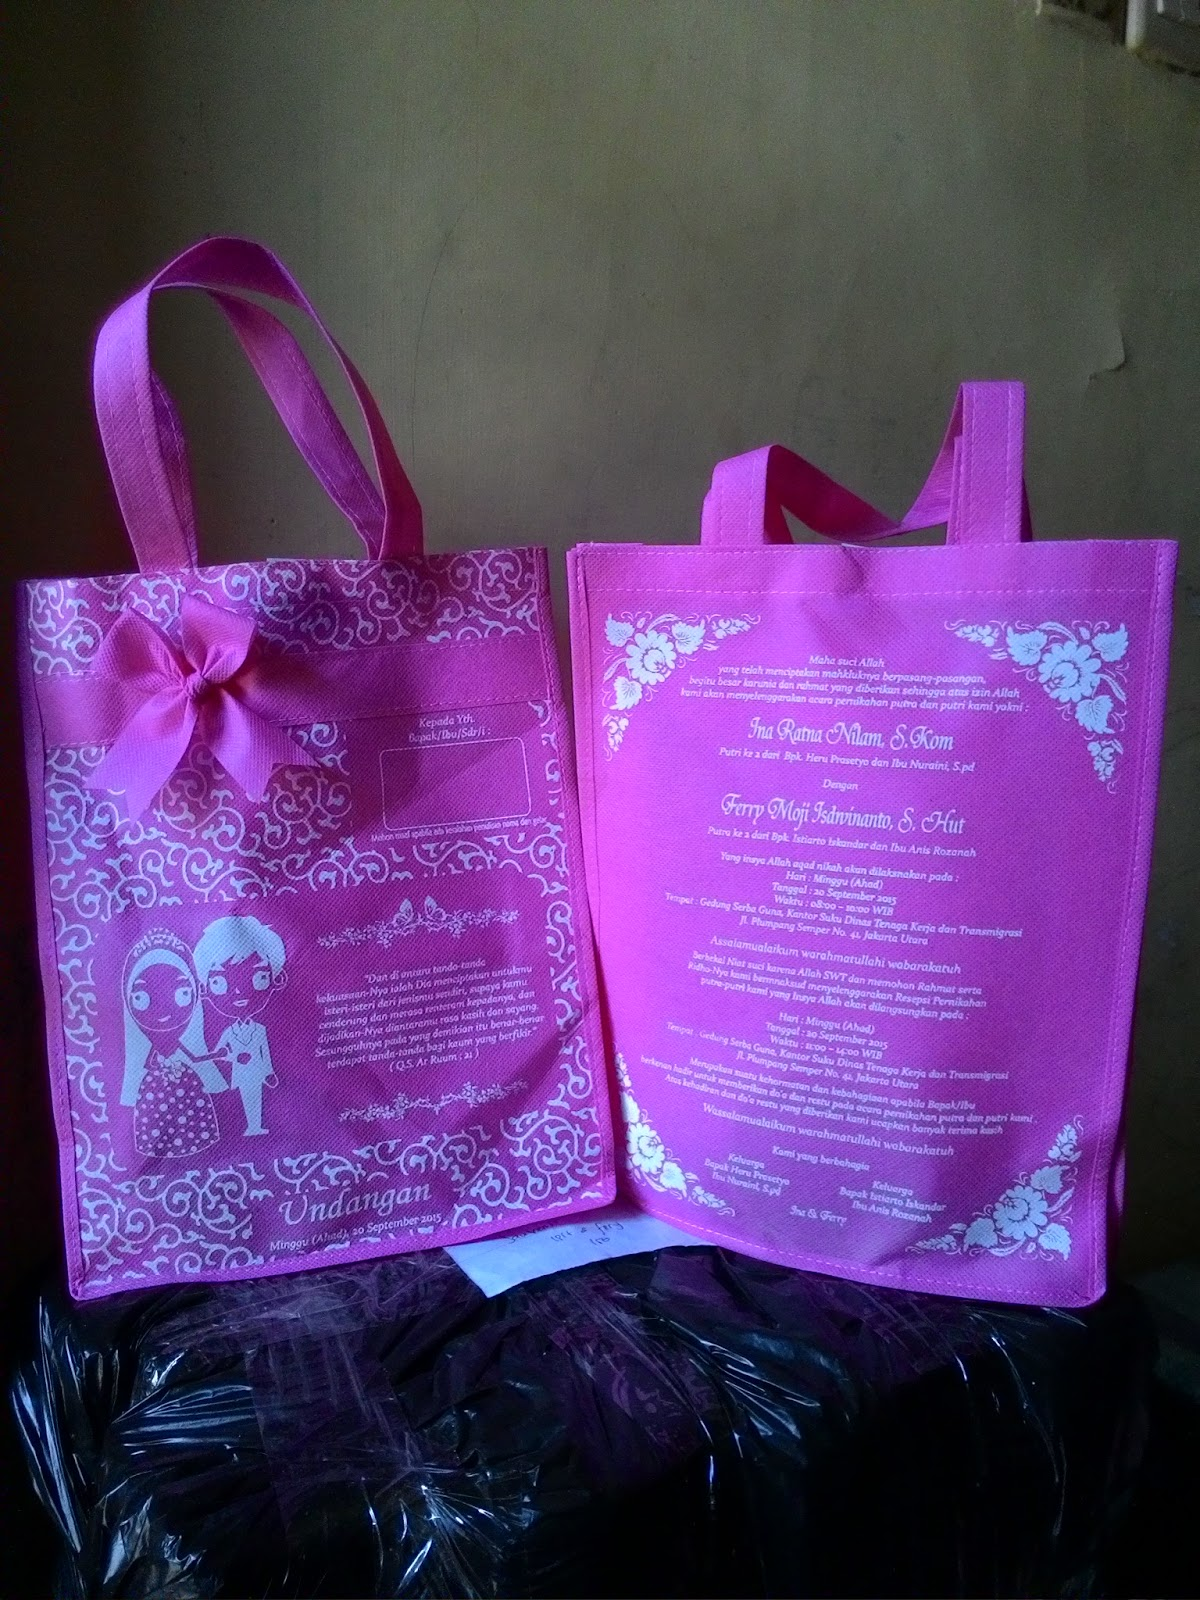 Tas Undangan Safa Pink Tua Rp 3300 Po Pusat Souvenir Pita Serut Kami Adalah Produsen Yang Unik Menarik Dan Berkualitas Tinggi Mulai Dari Jinjing Furing Parcel